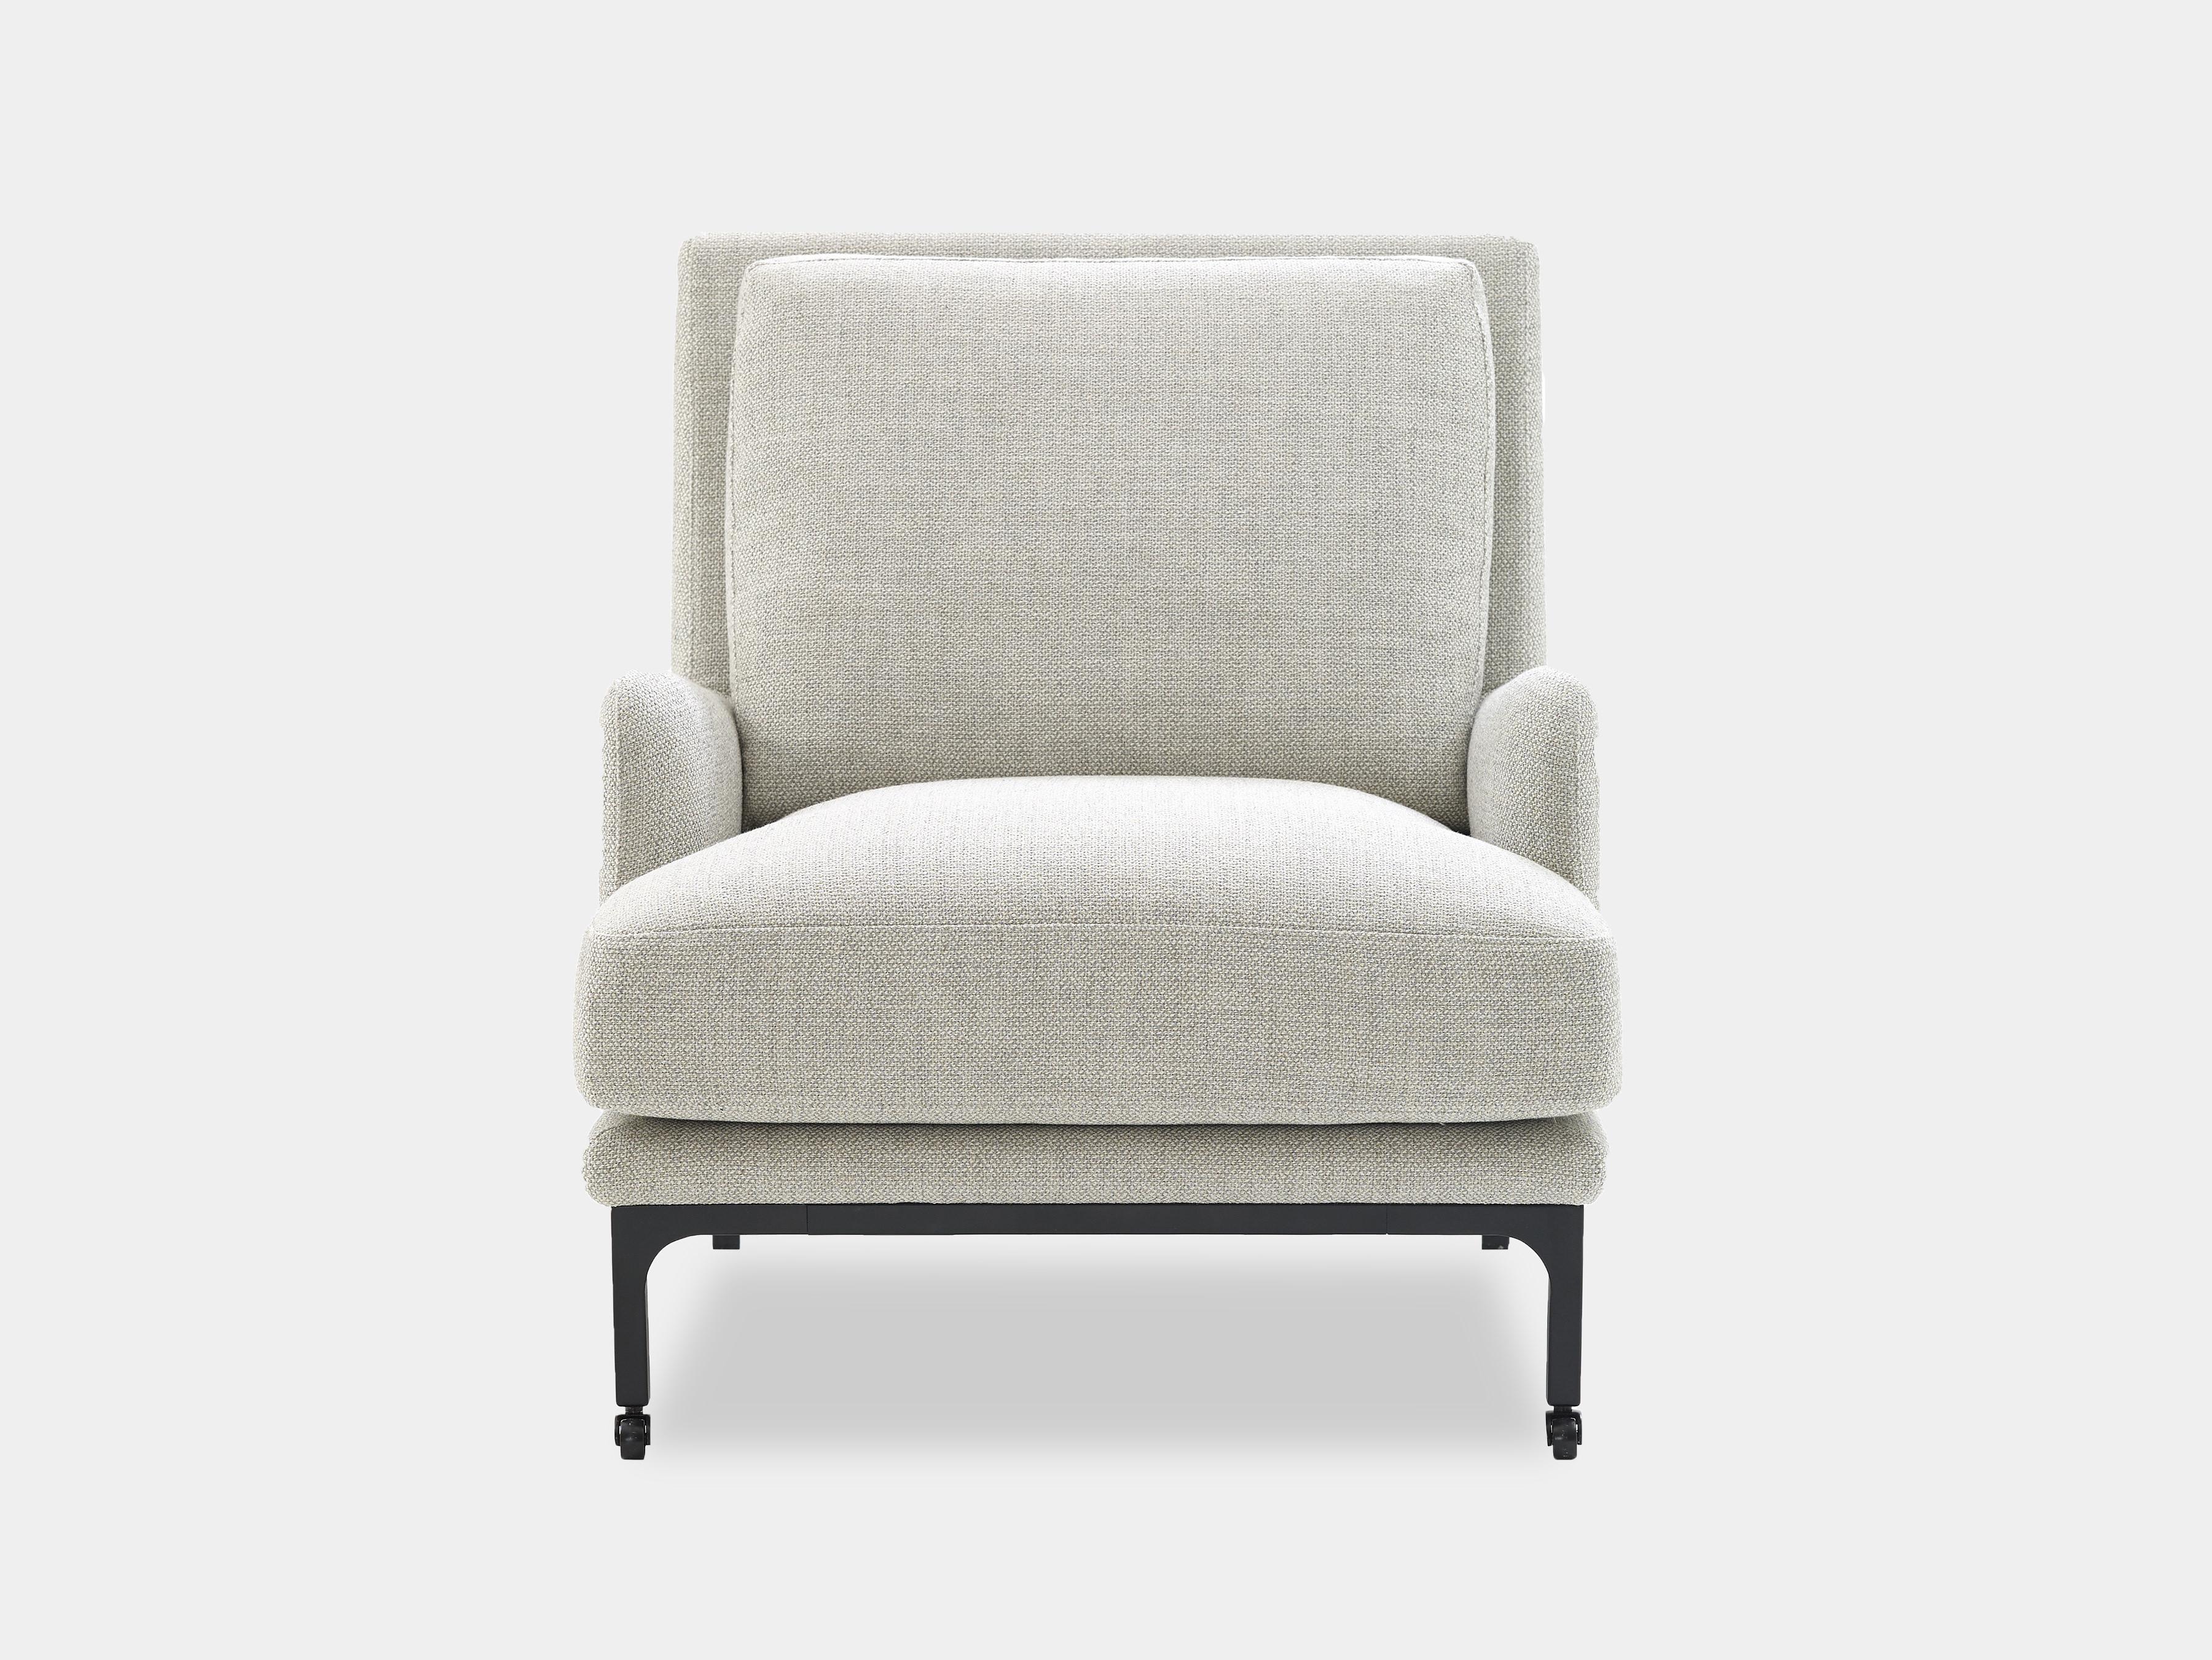 mr jones easy chair 011